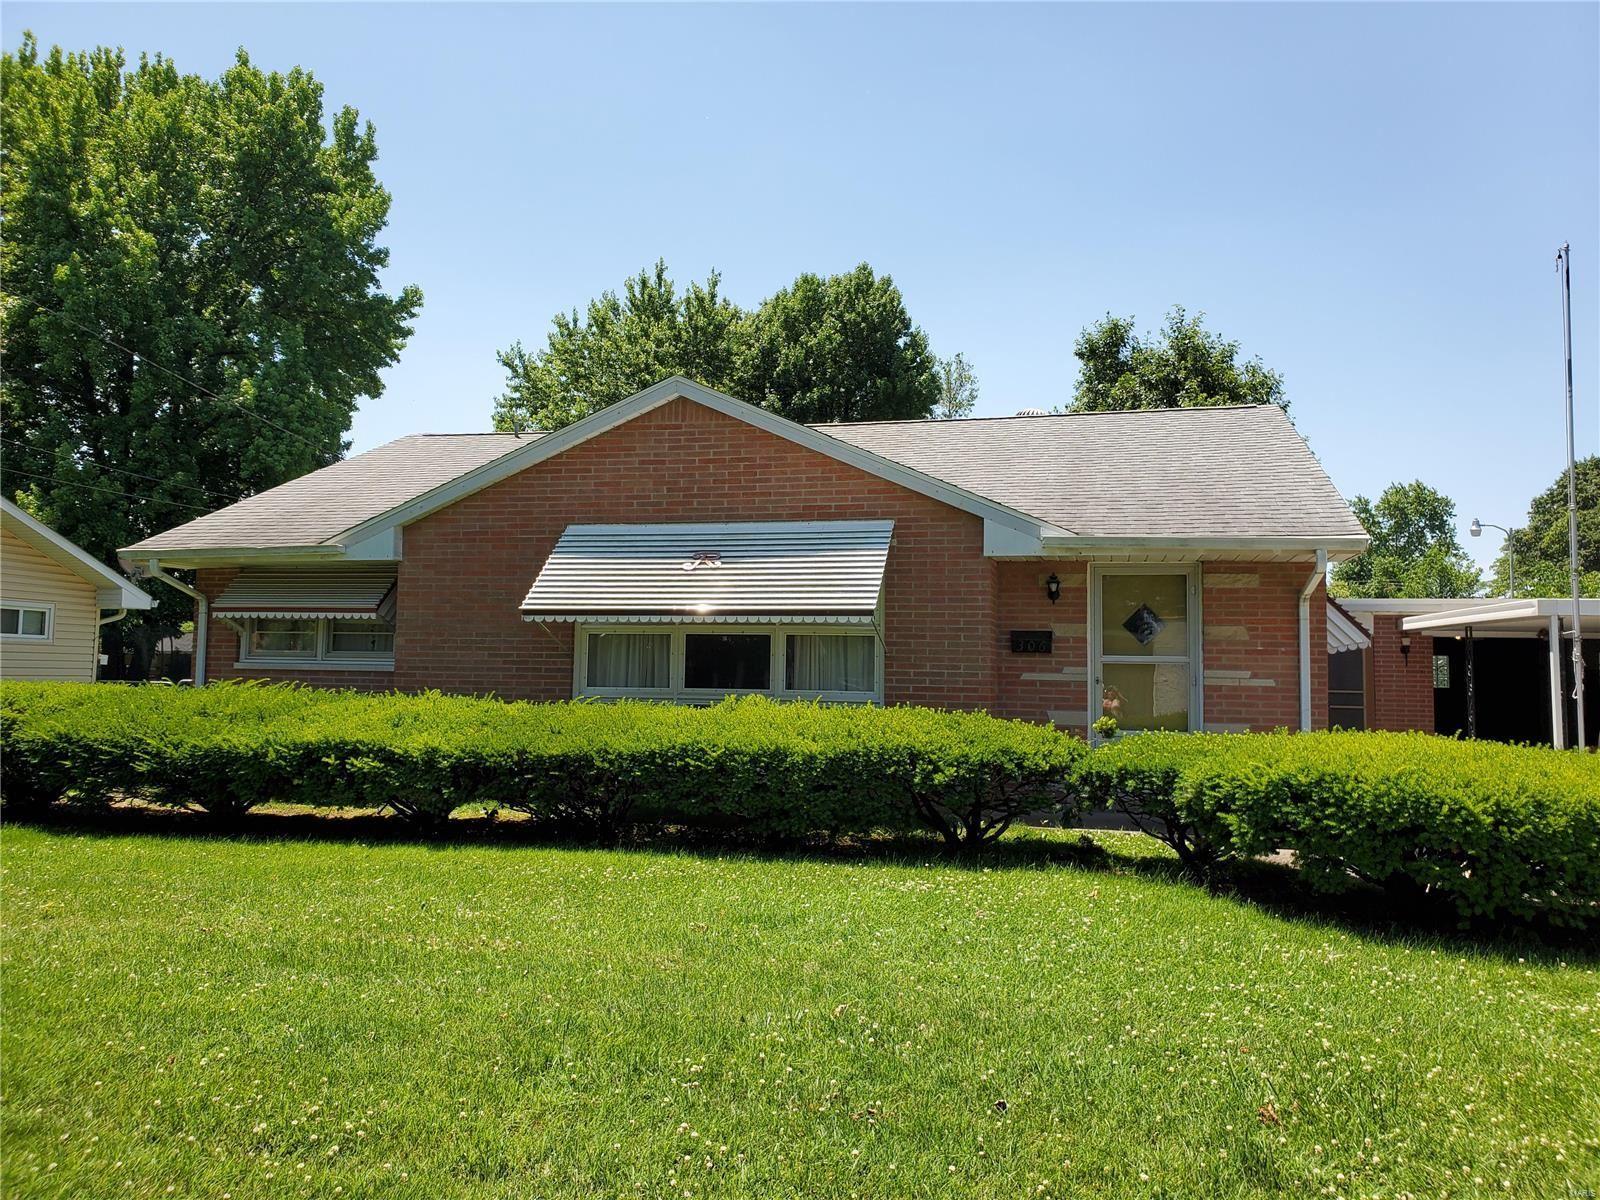 306 Crestwood Drive, Collinsville, IL 62234 - MLS#: 20041831